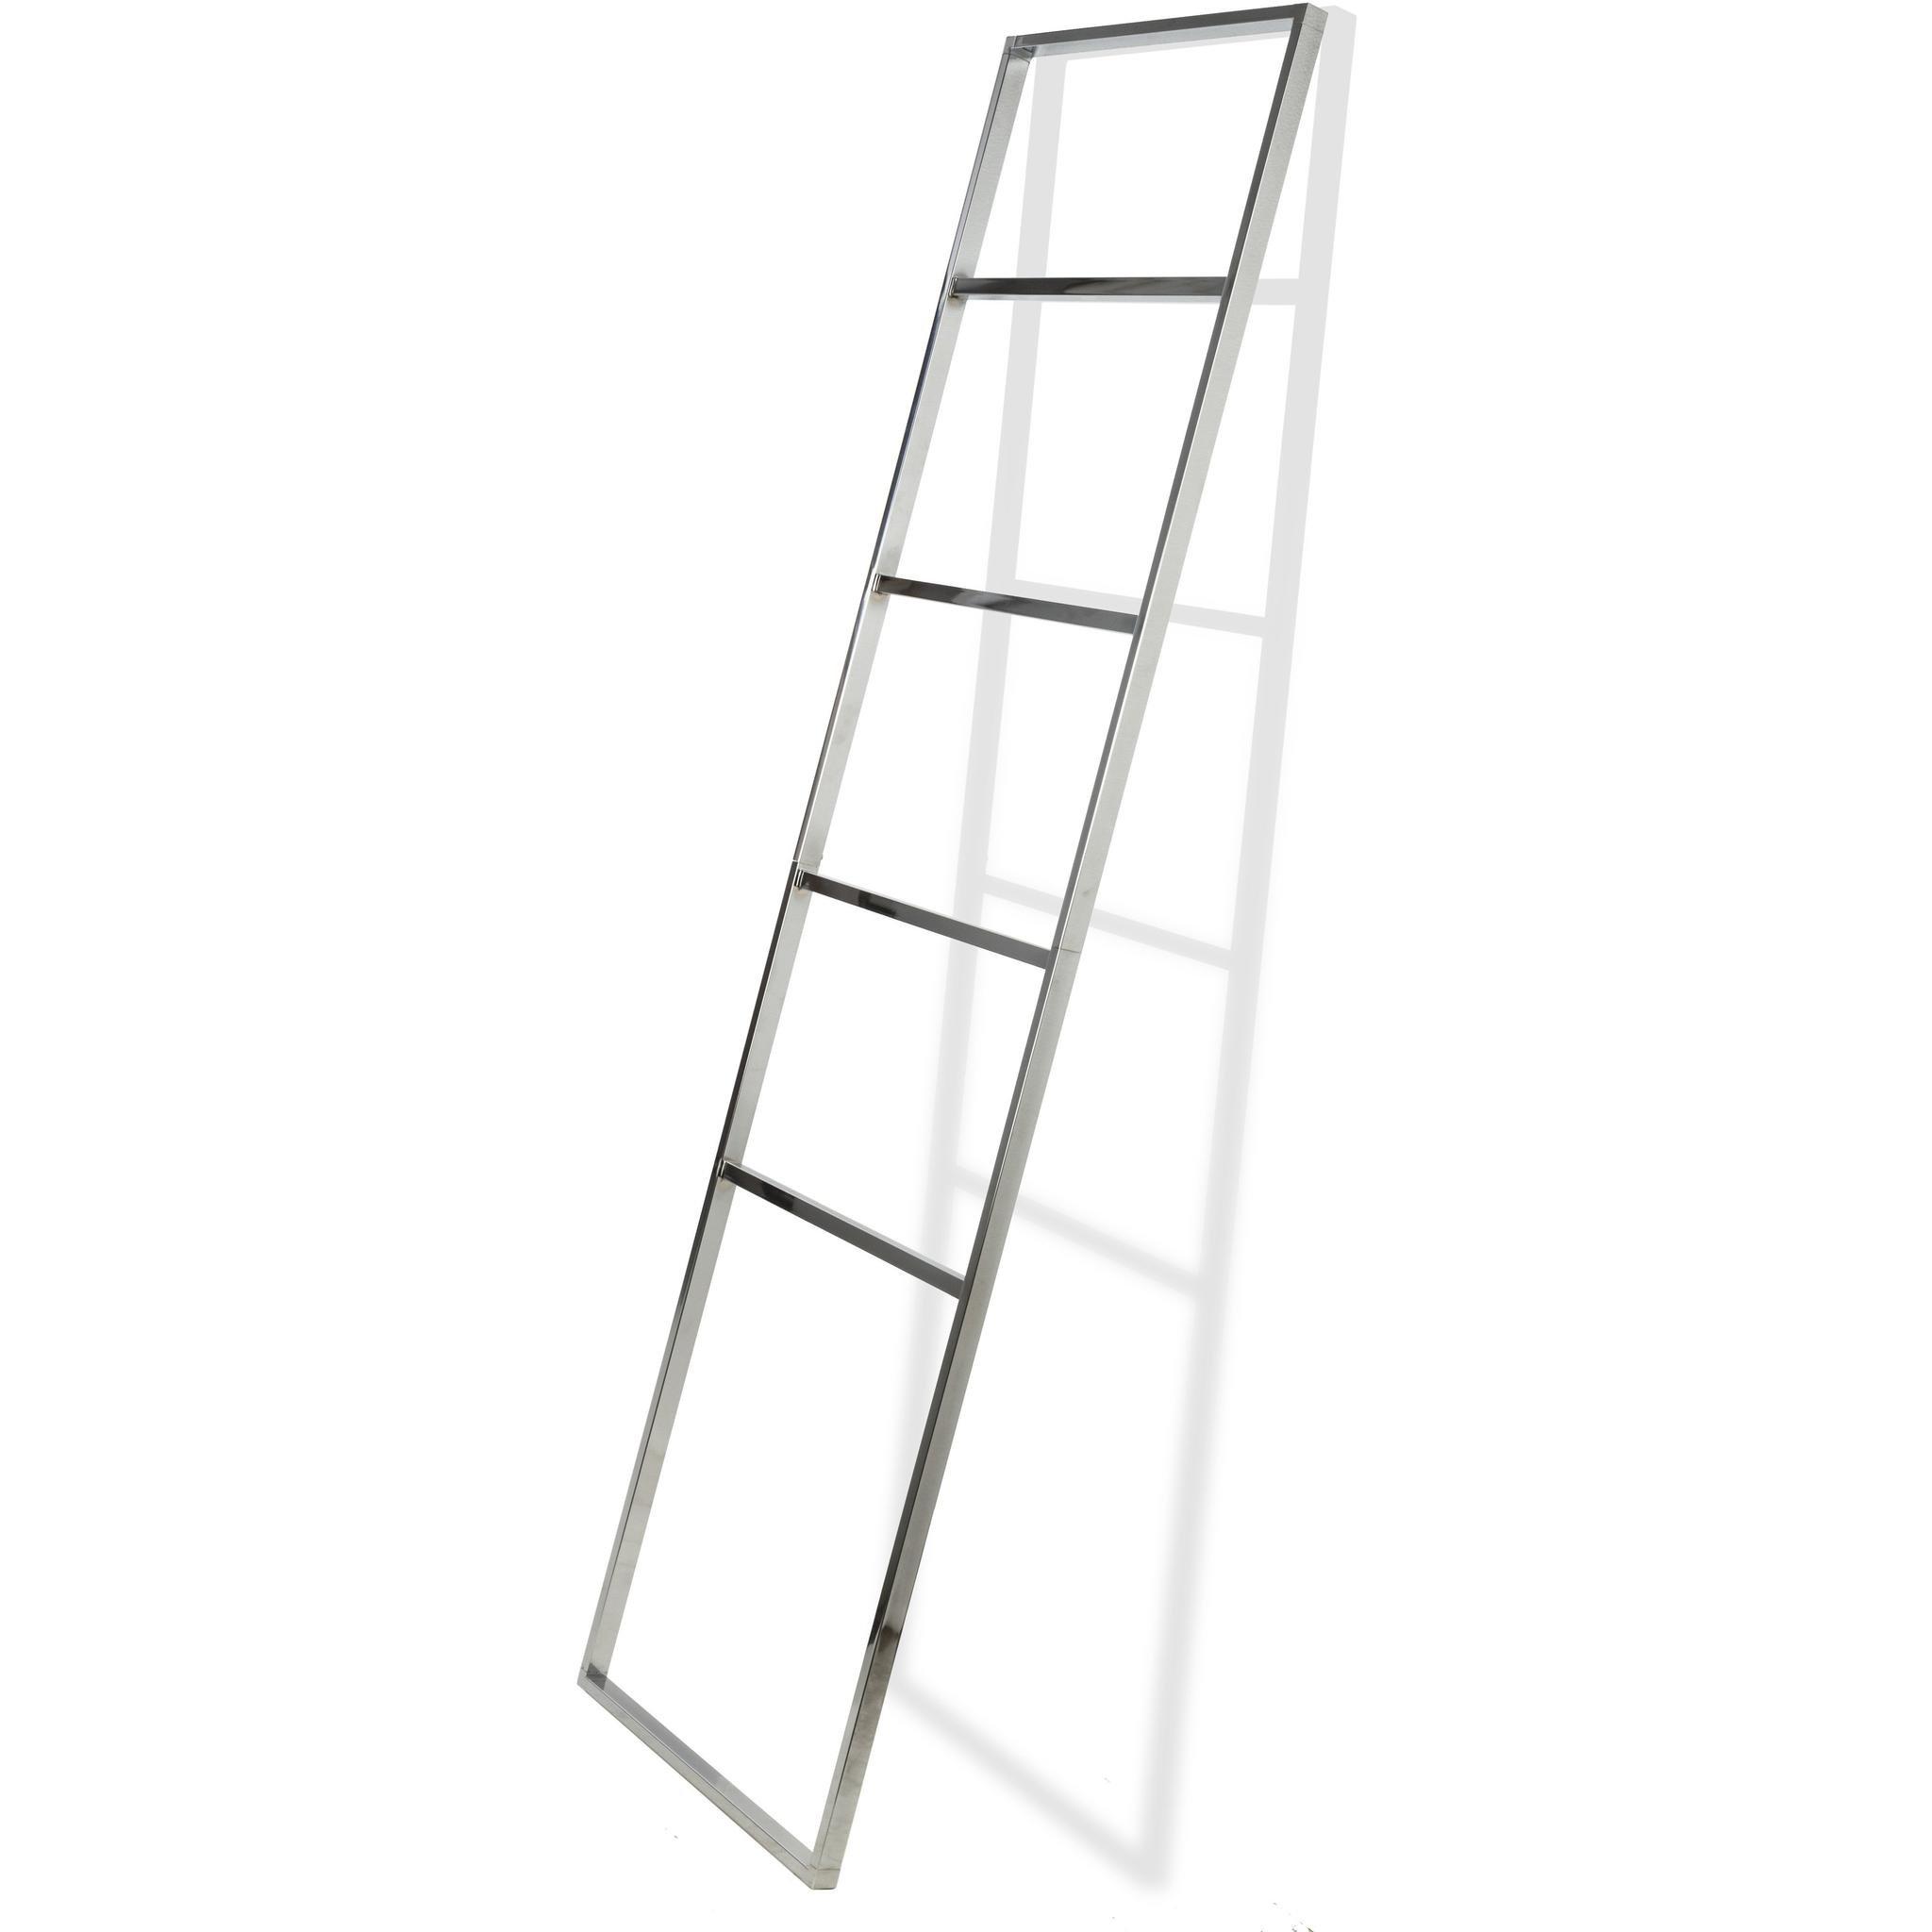 CP Standing Towel Rack Ladder for Bathroom Spa Towel Hanger, Stainless Steel